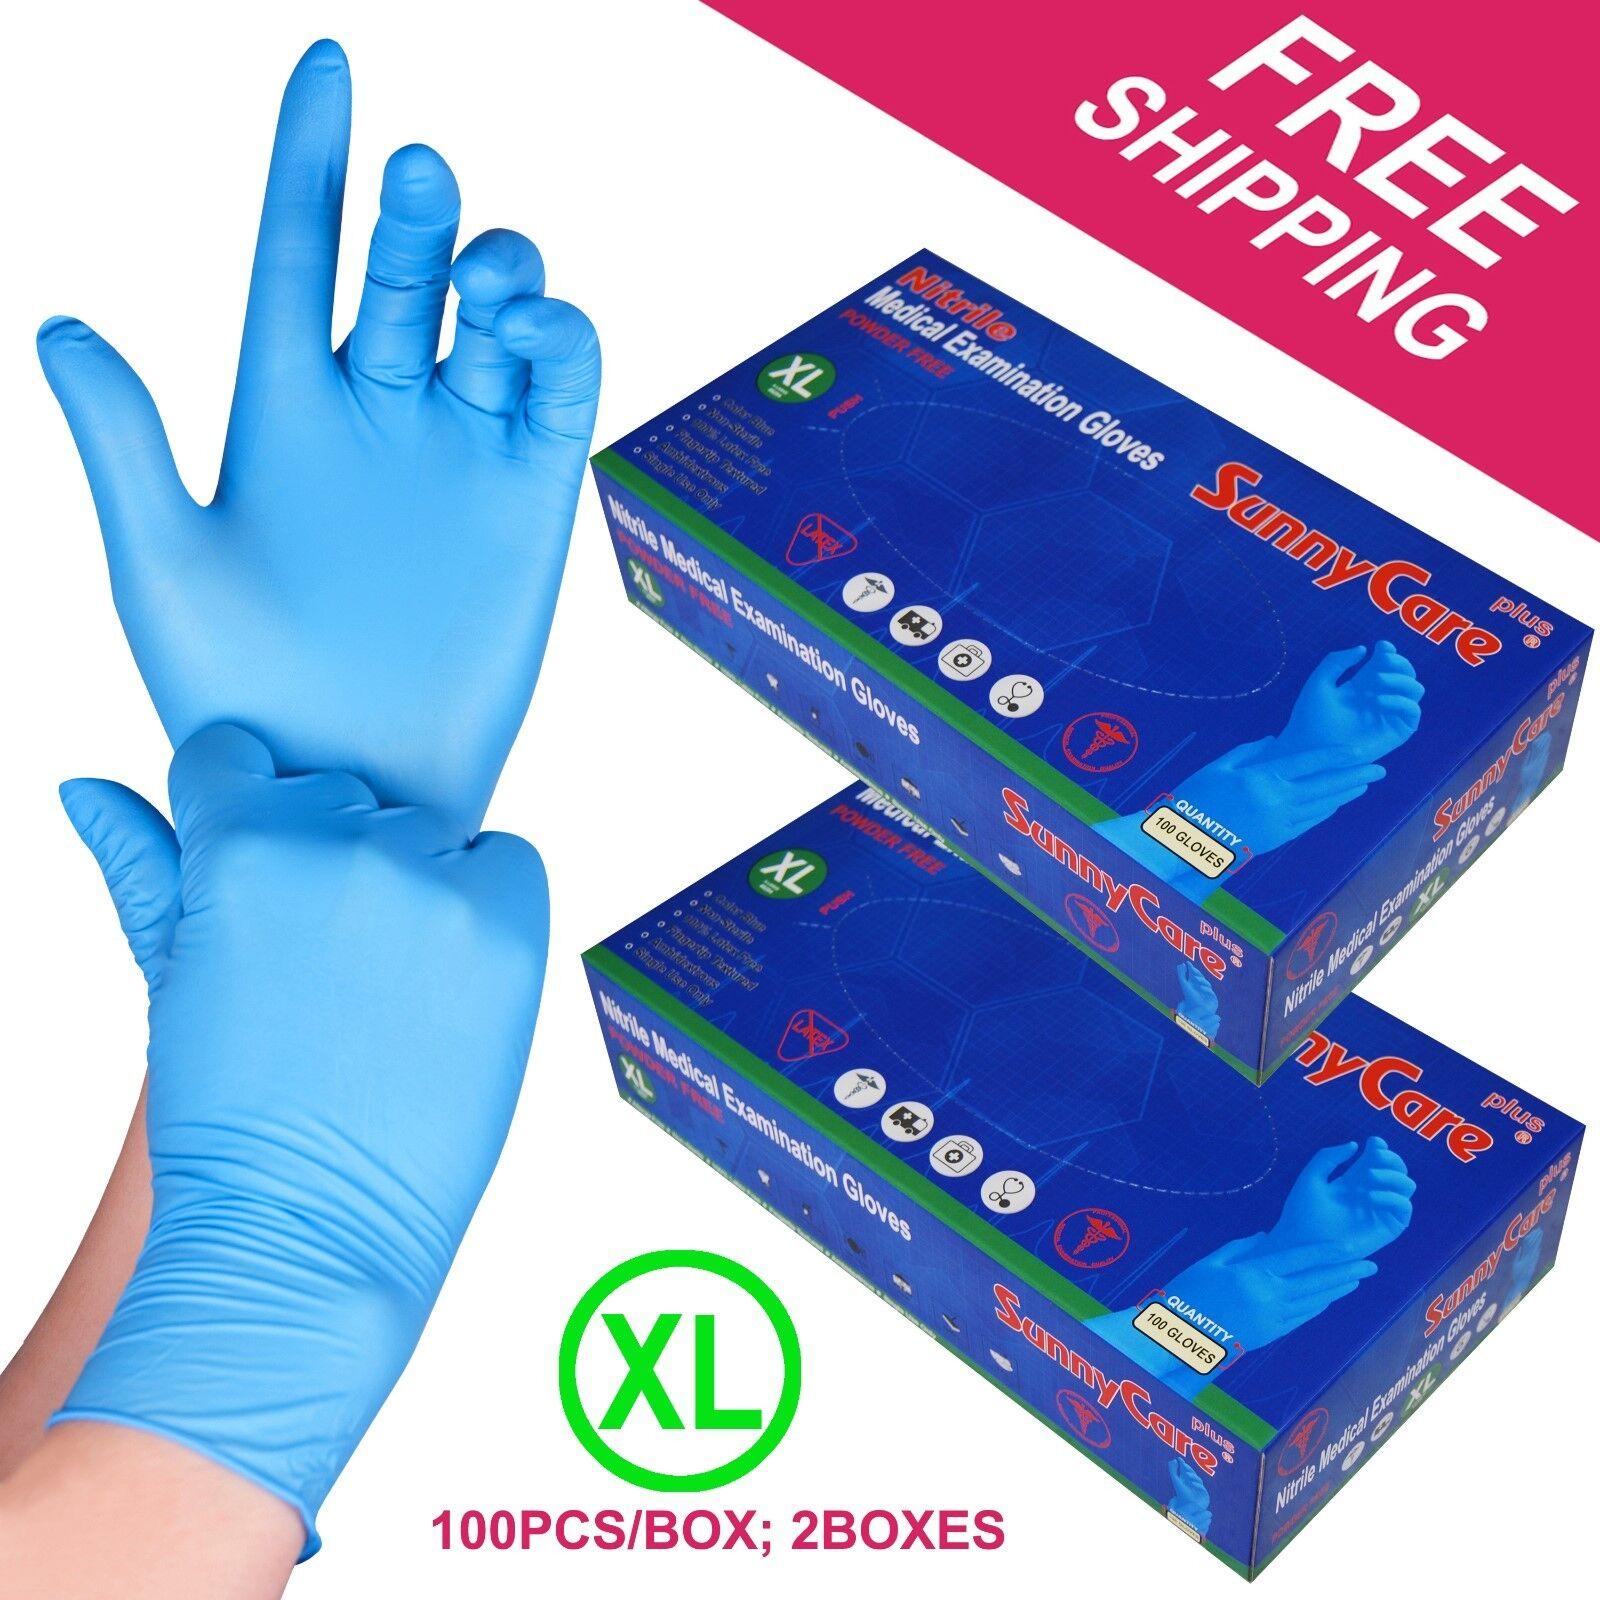 200 /2boxes Blue Nitrile Medical Exam Gloves Powder Free   X